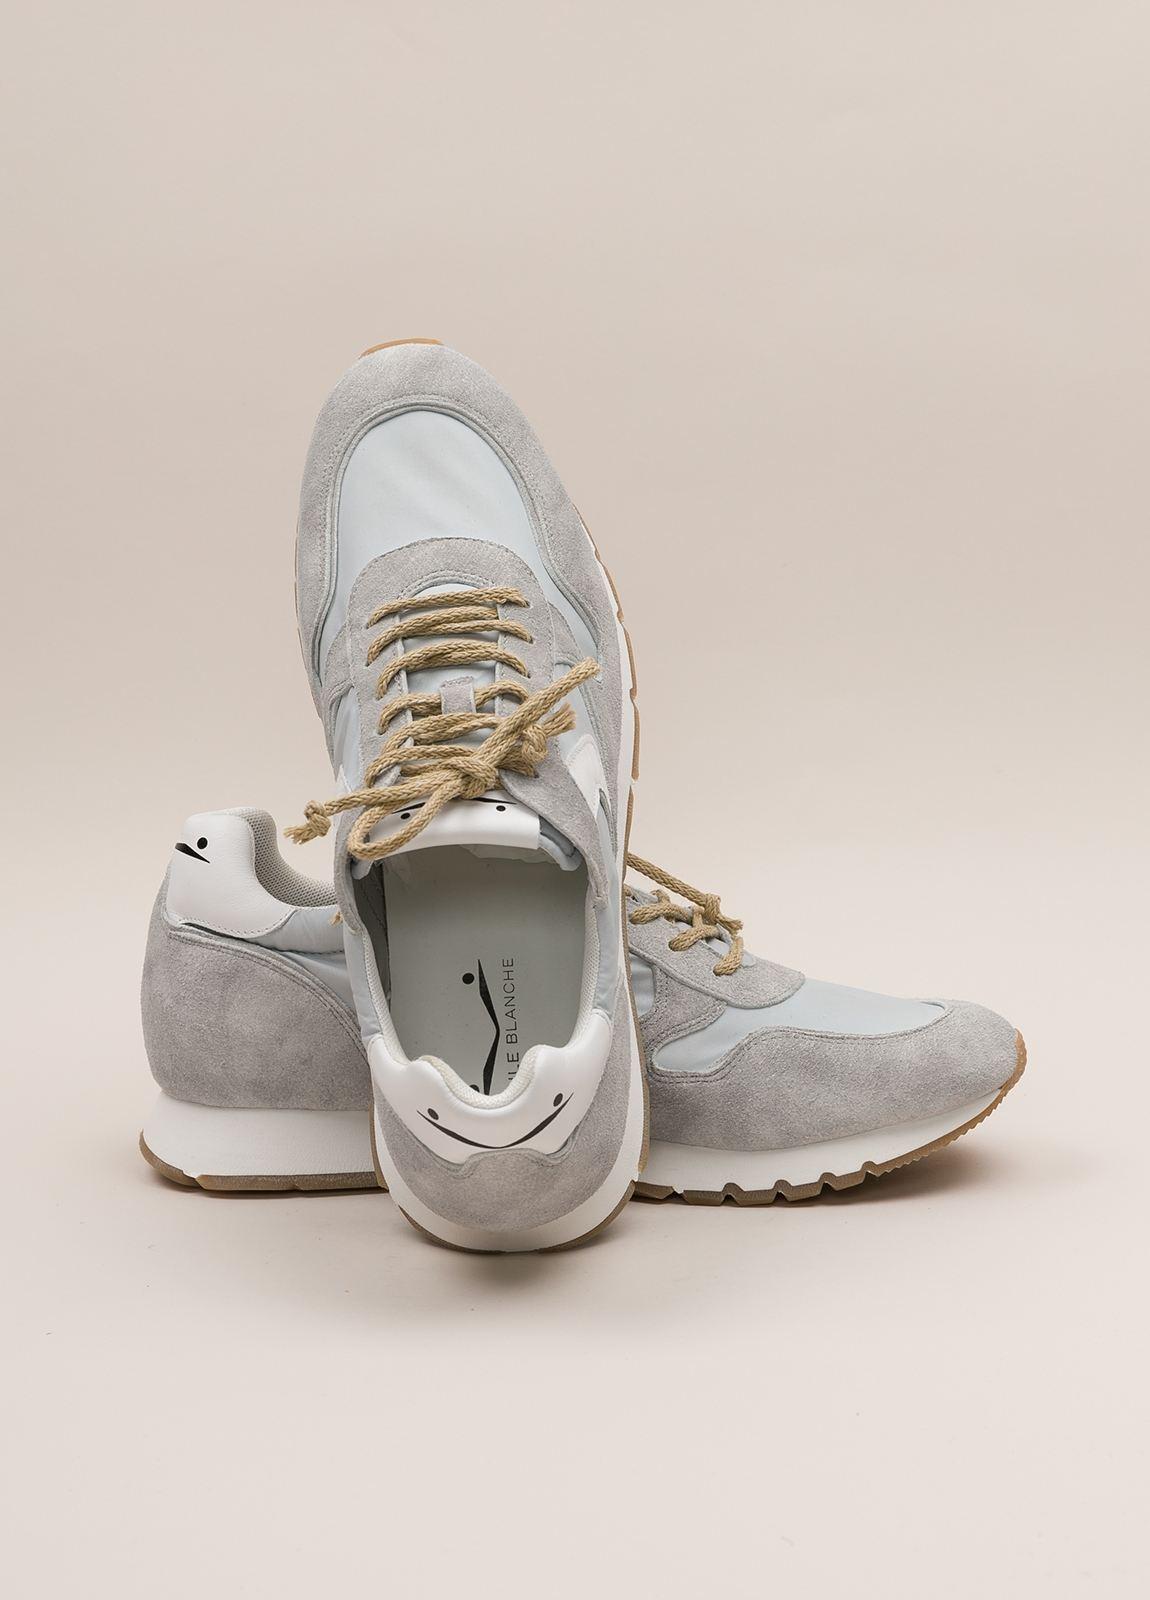 Zapatillas casual VOILE BLANCHE gris claro - Ítem2